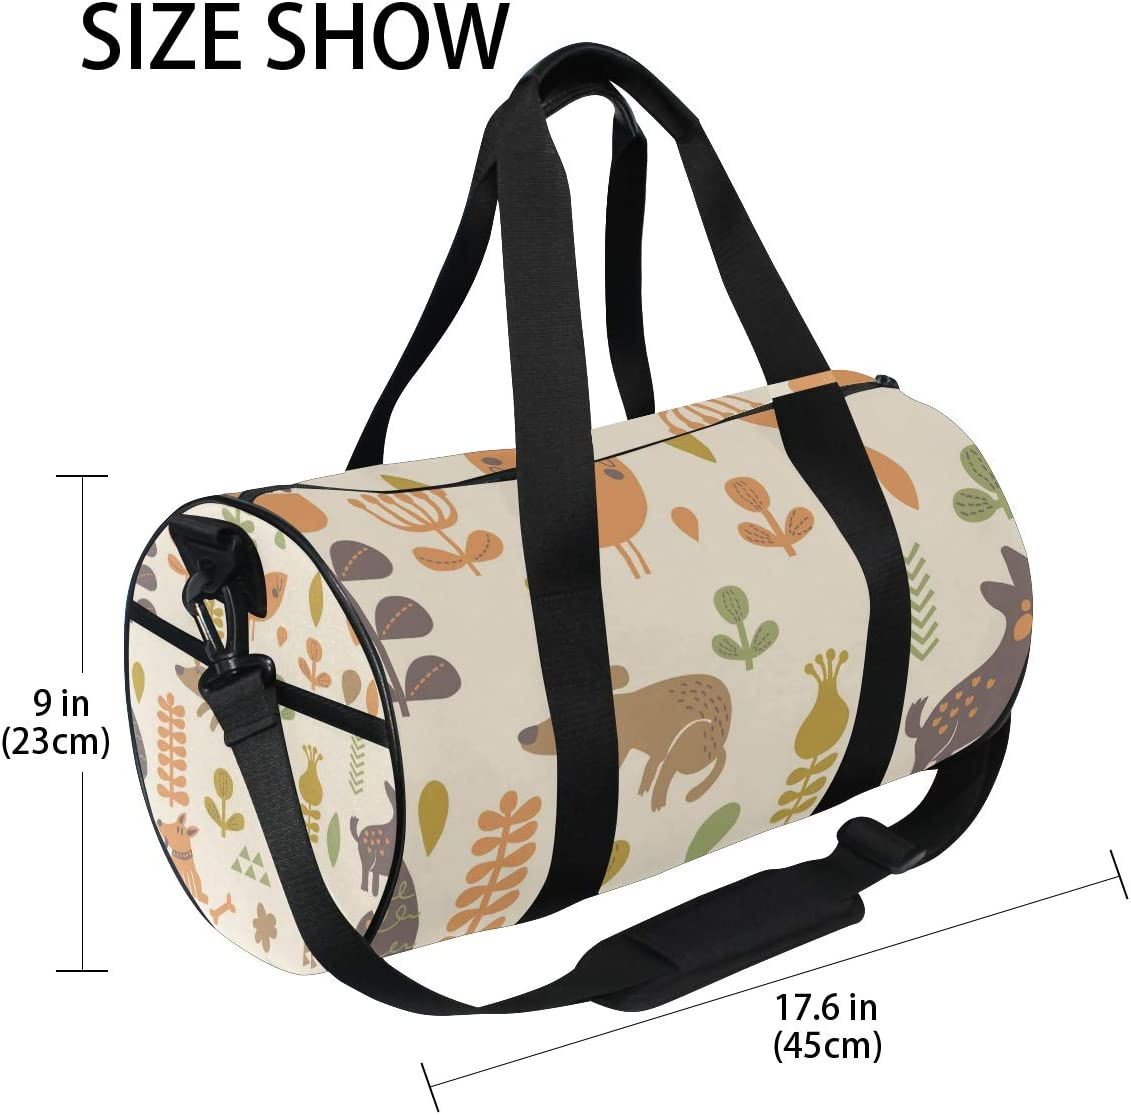 MALPLENA Dogs And Plants Drum gym duffel bag women Travel Bag